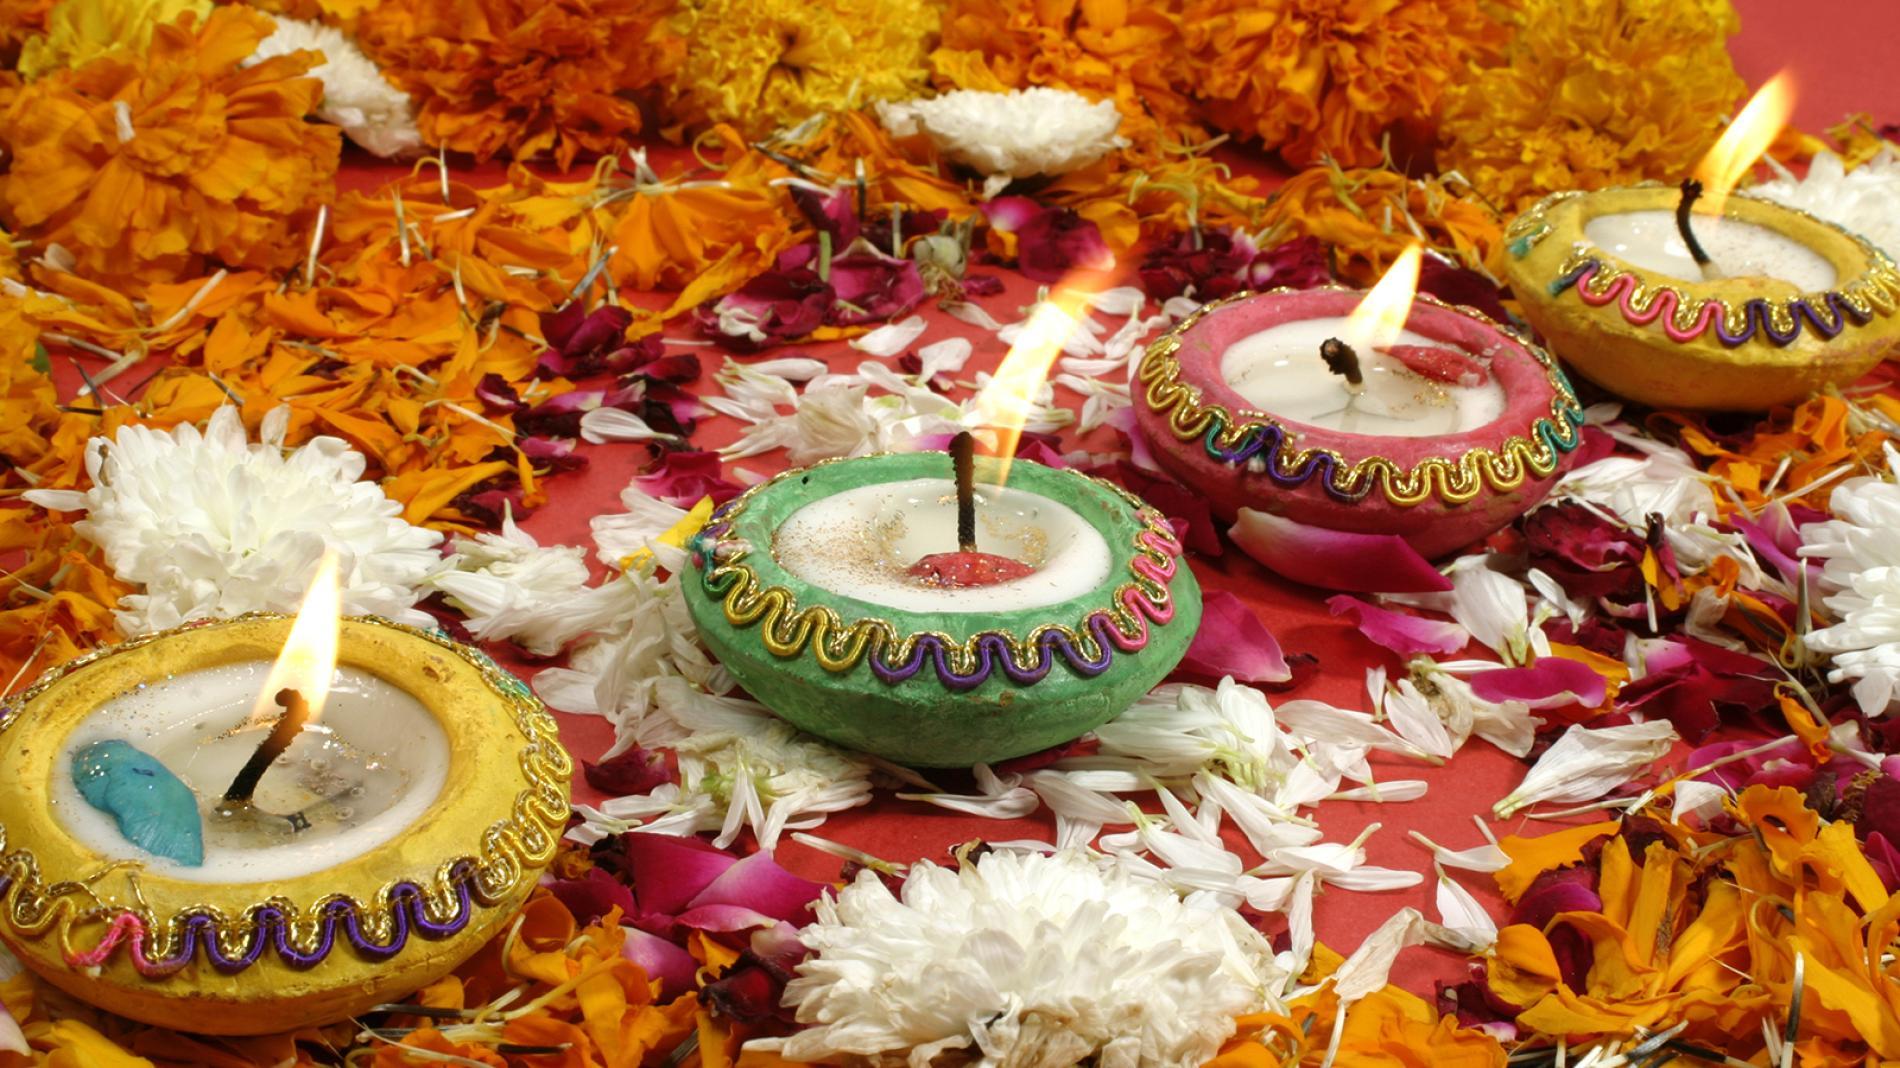 india-diwali.ngsversion.1396531665889.adapt.1900.1